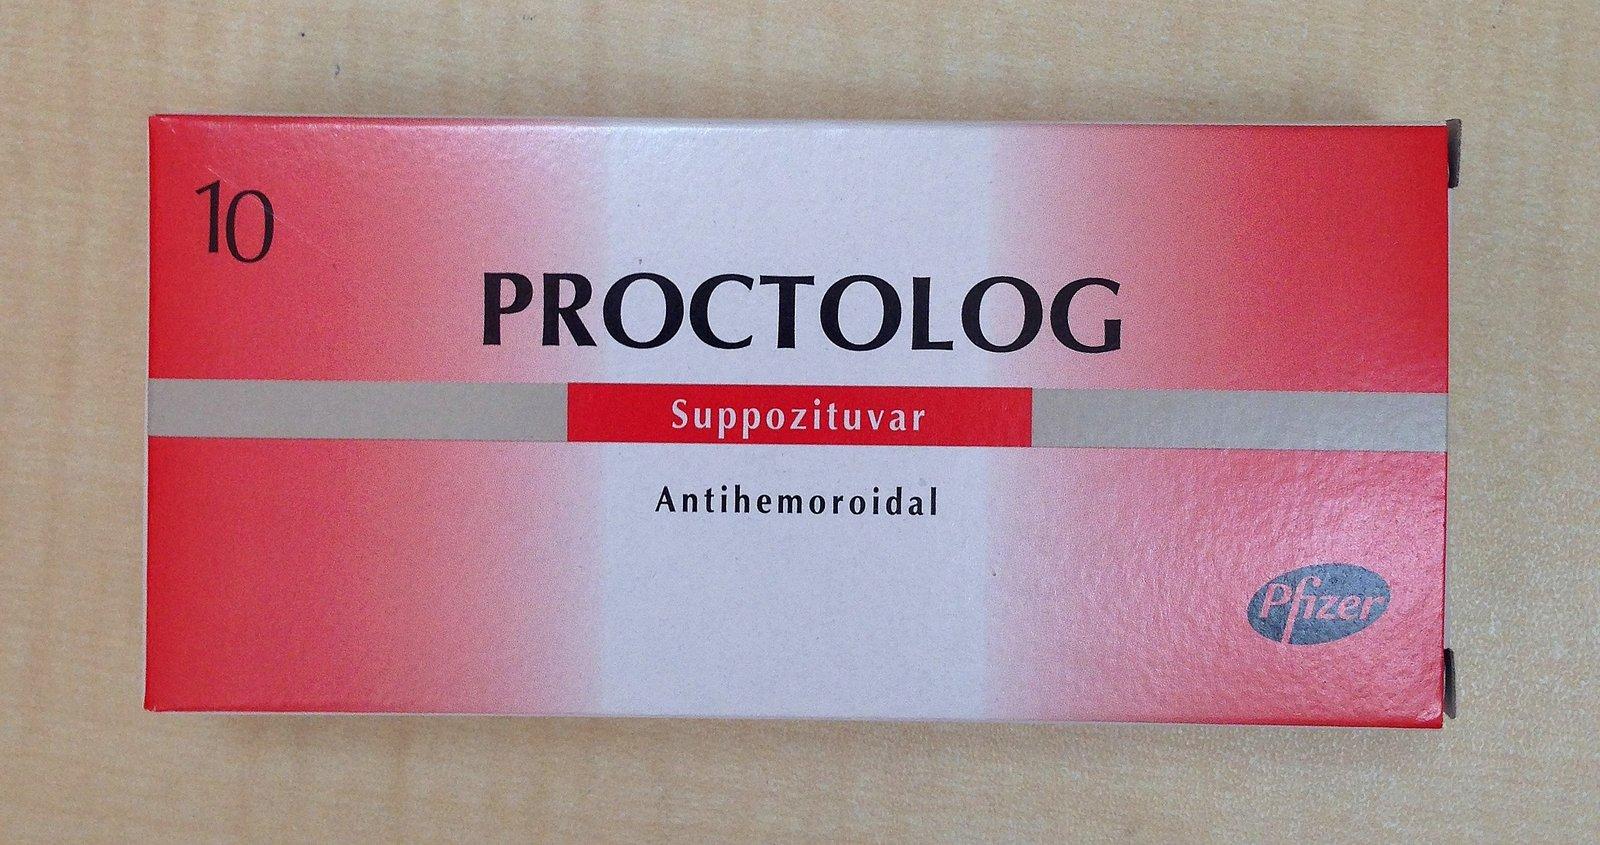 Proctolog fitil nasıl uygulanır